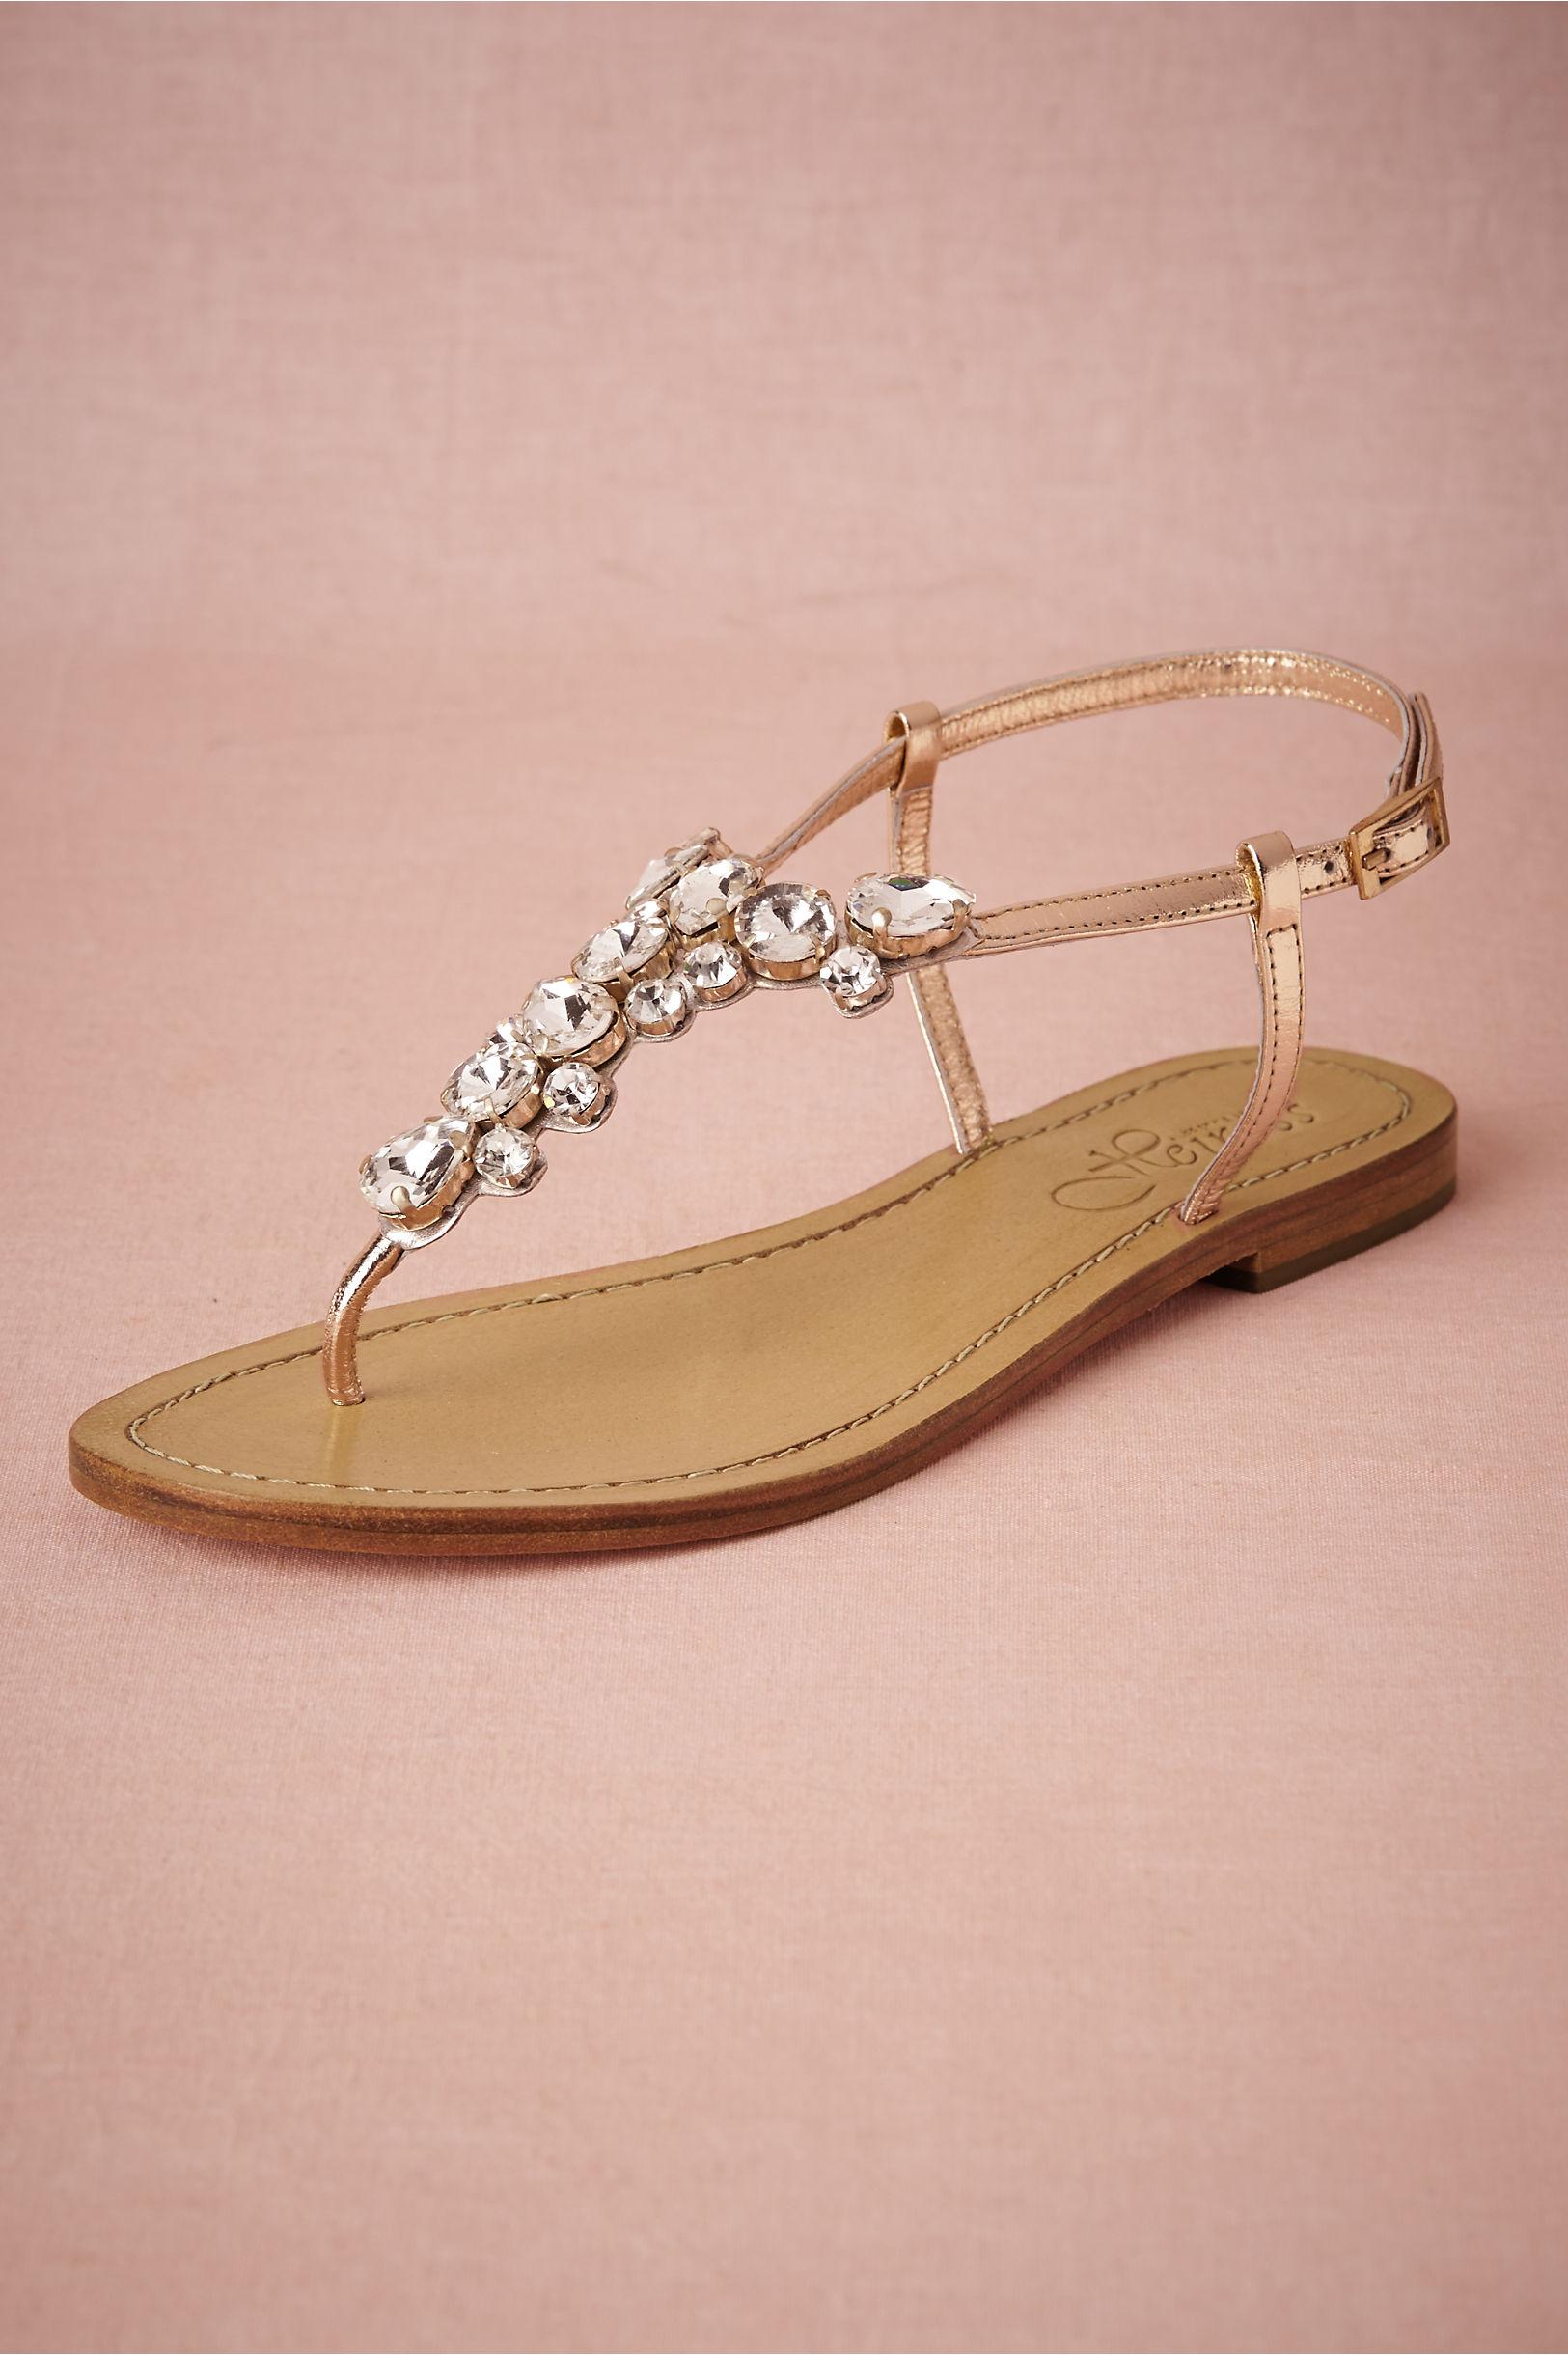 Sandals honeymoon shoes with rhinestone - Crystal Demure Sandals Bhldn